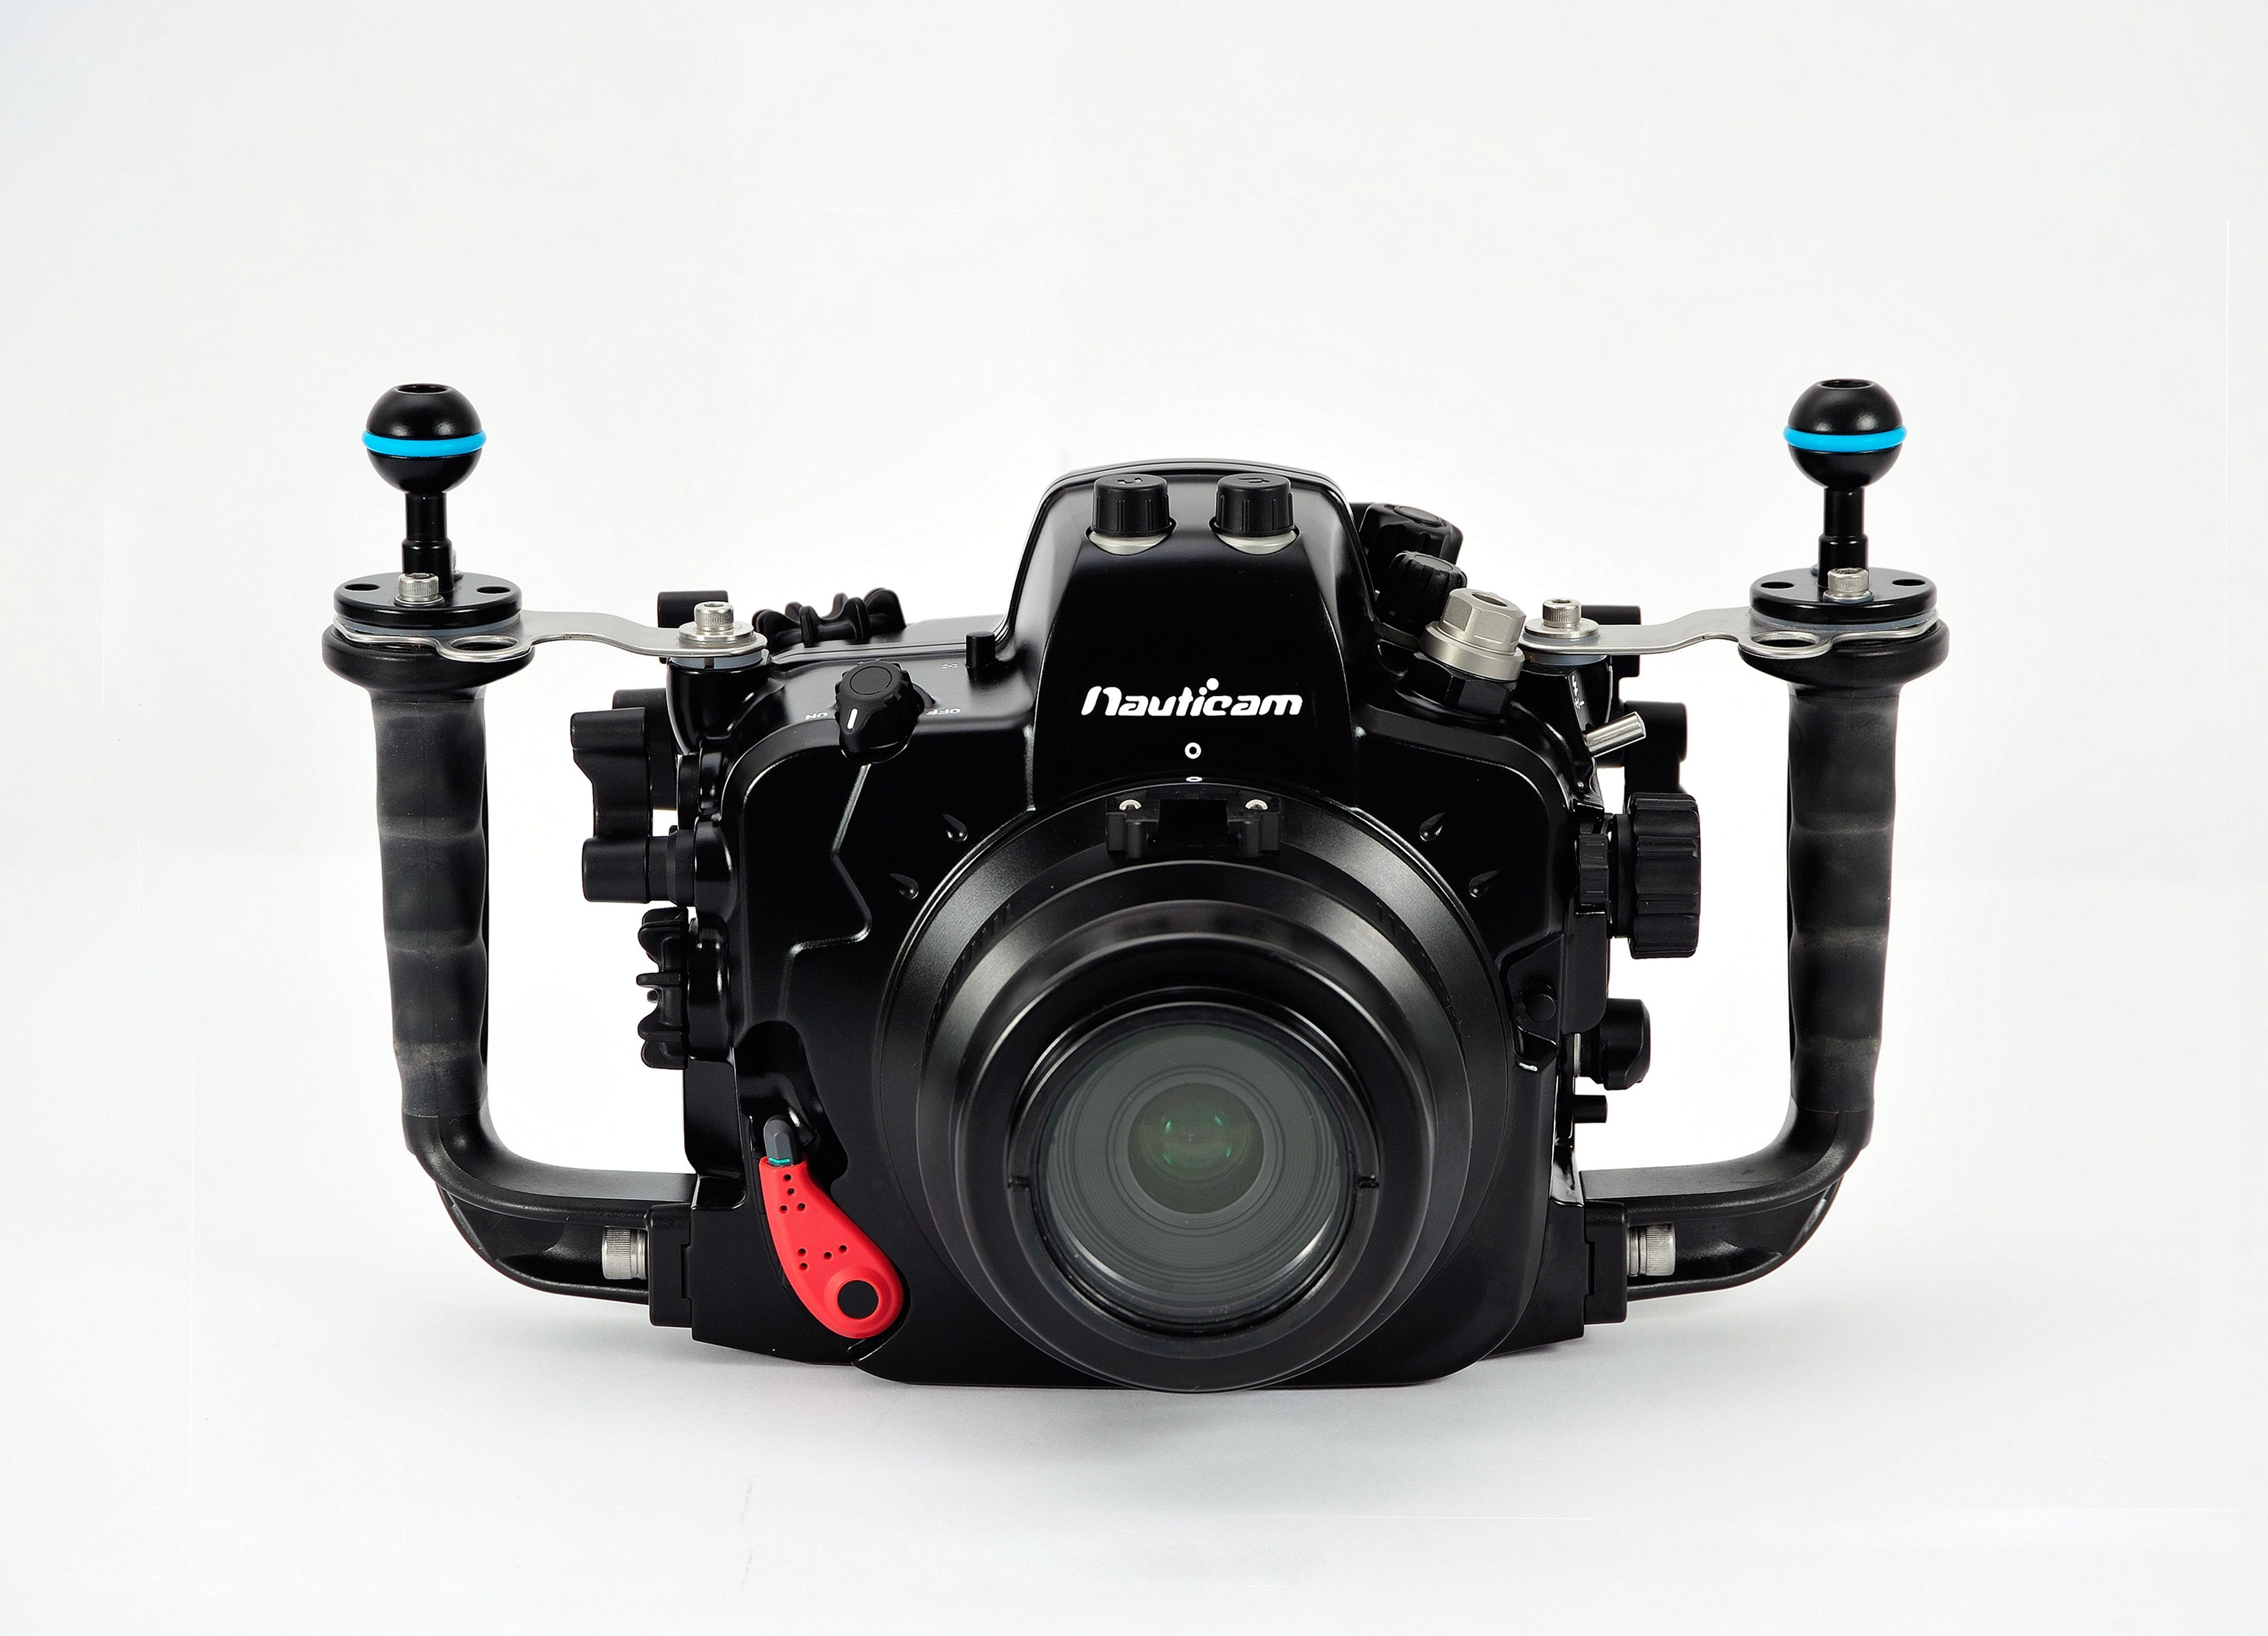 фототехника для подводной съемки поводу без